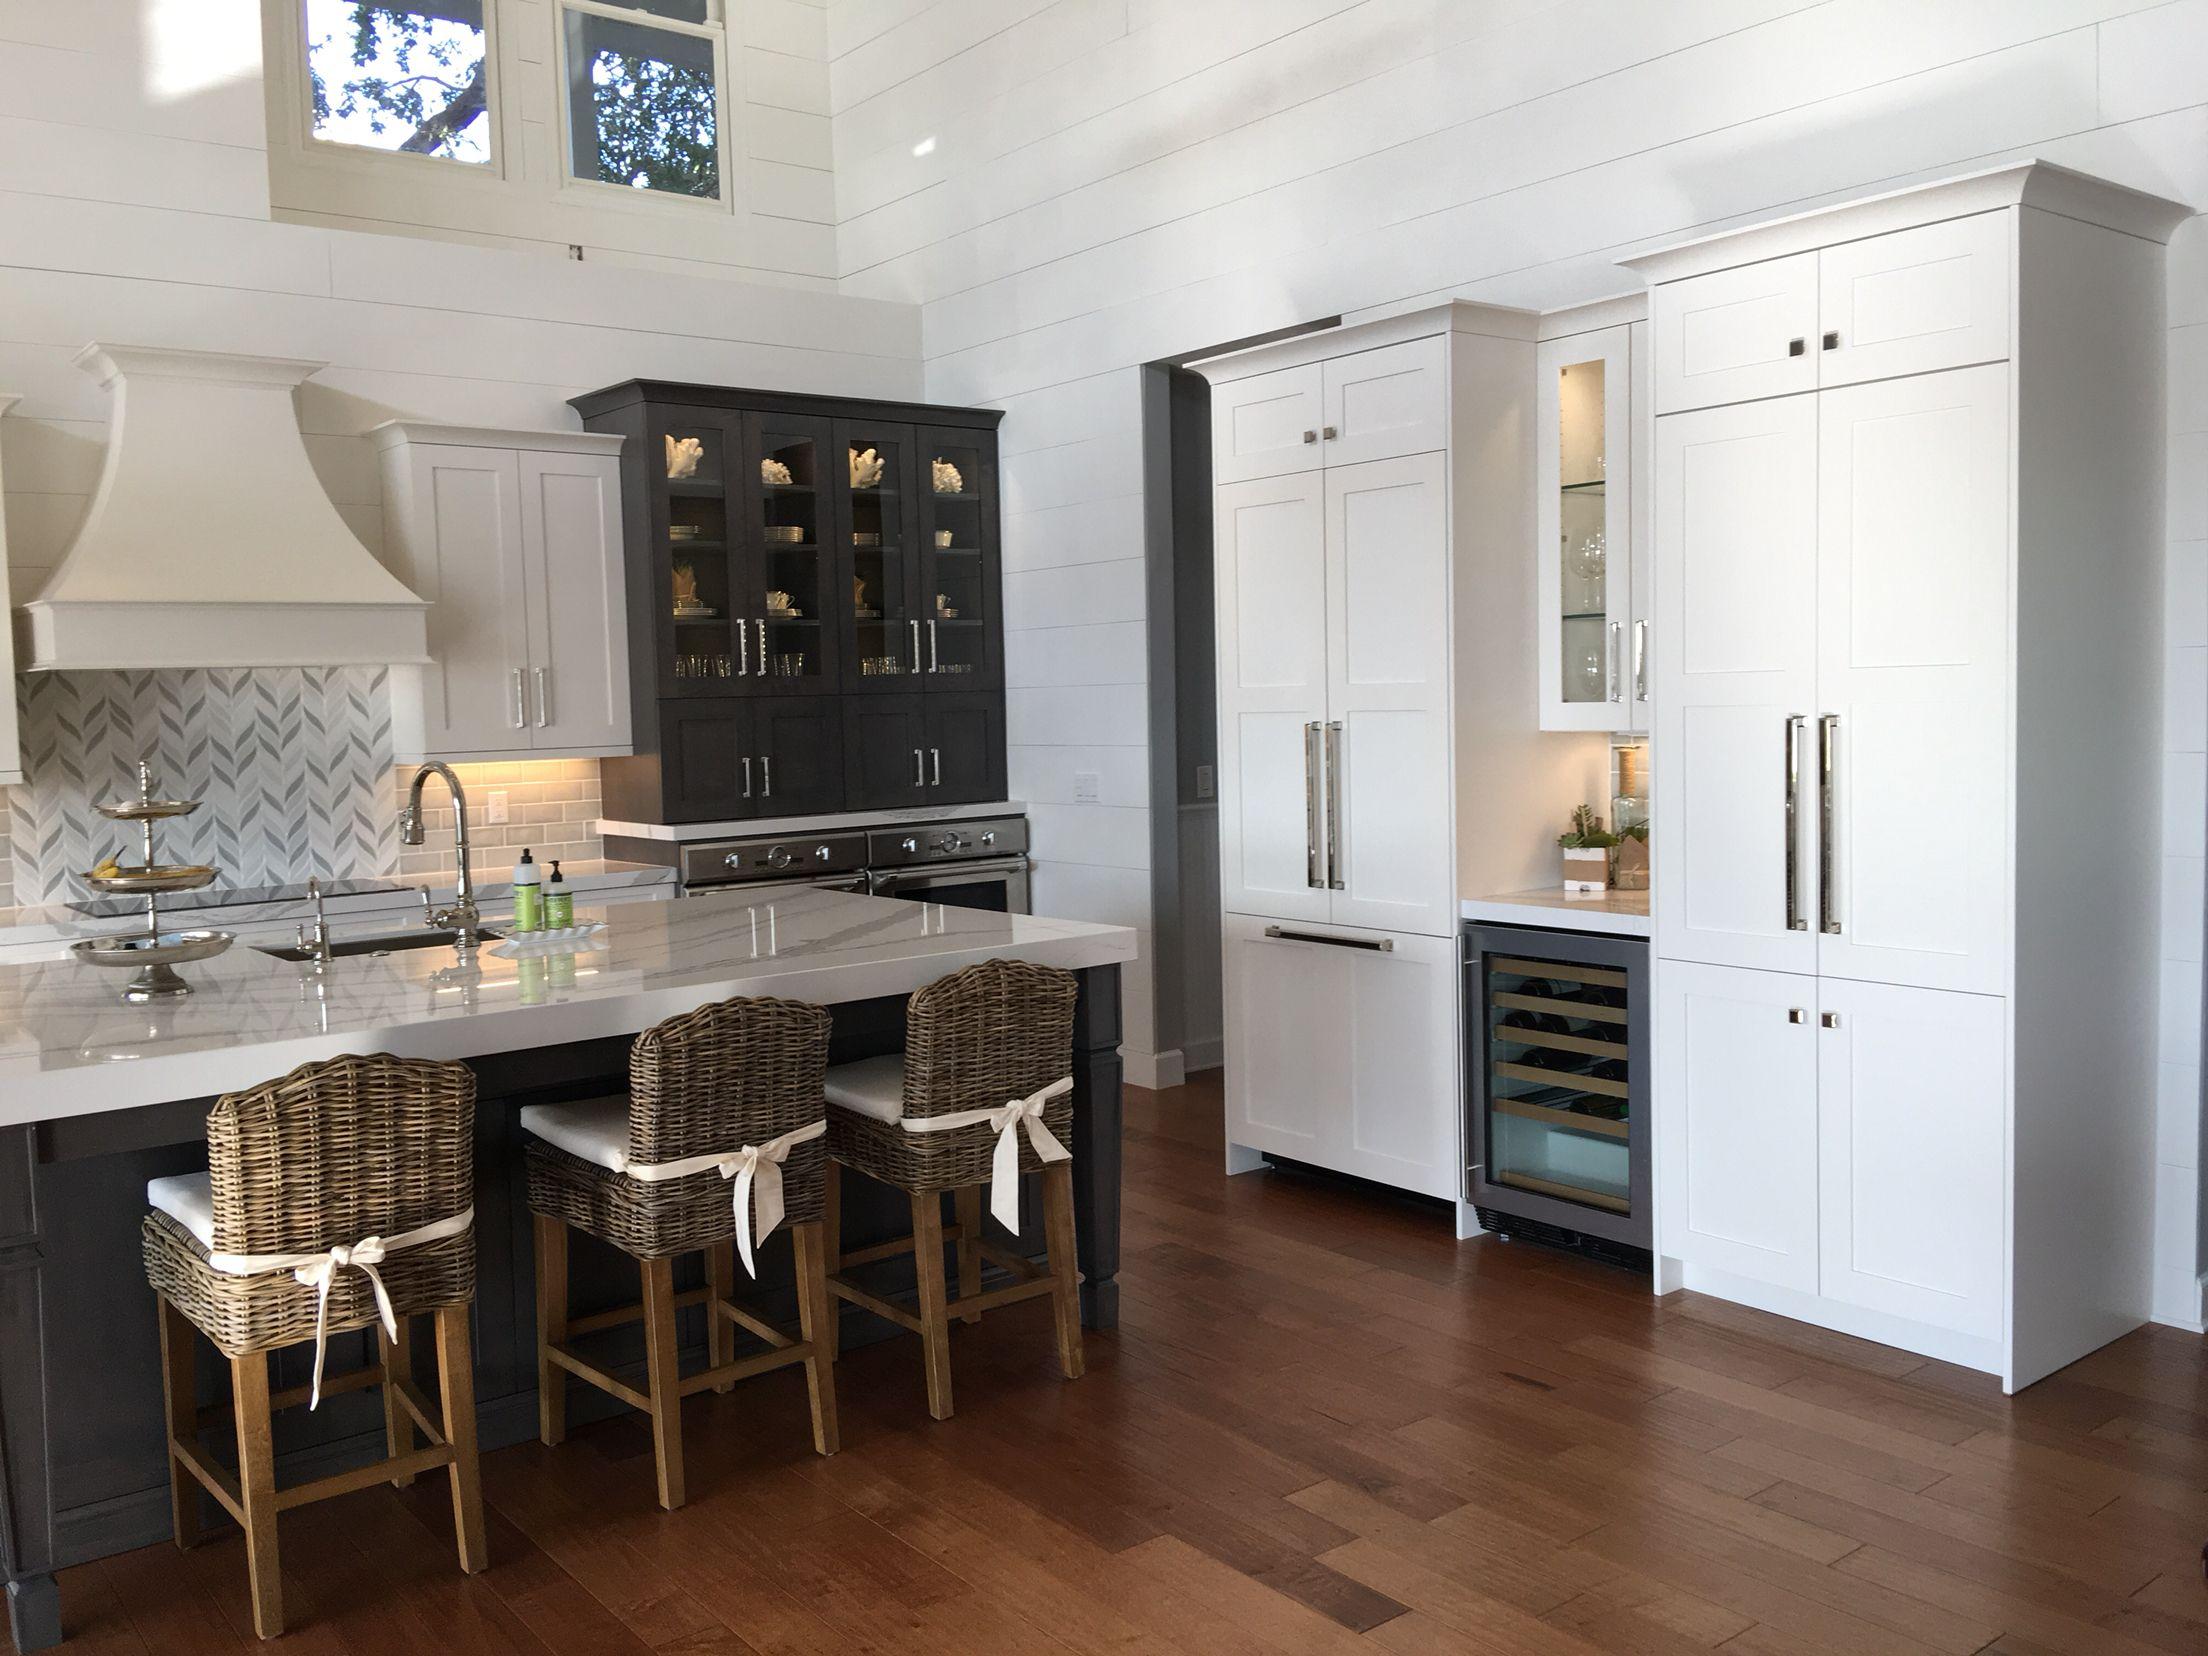 Ballard Design Rosalind Counter Stools Built In Thermadore Fridge